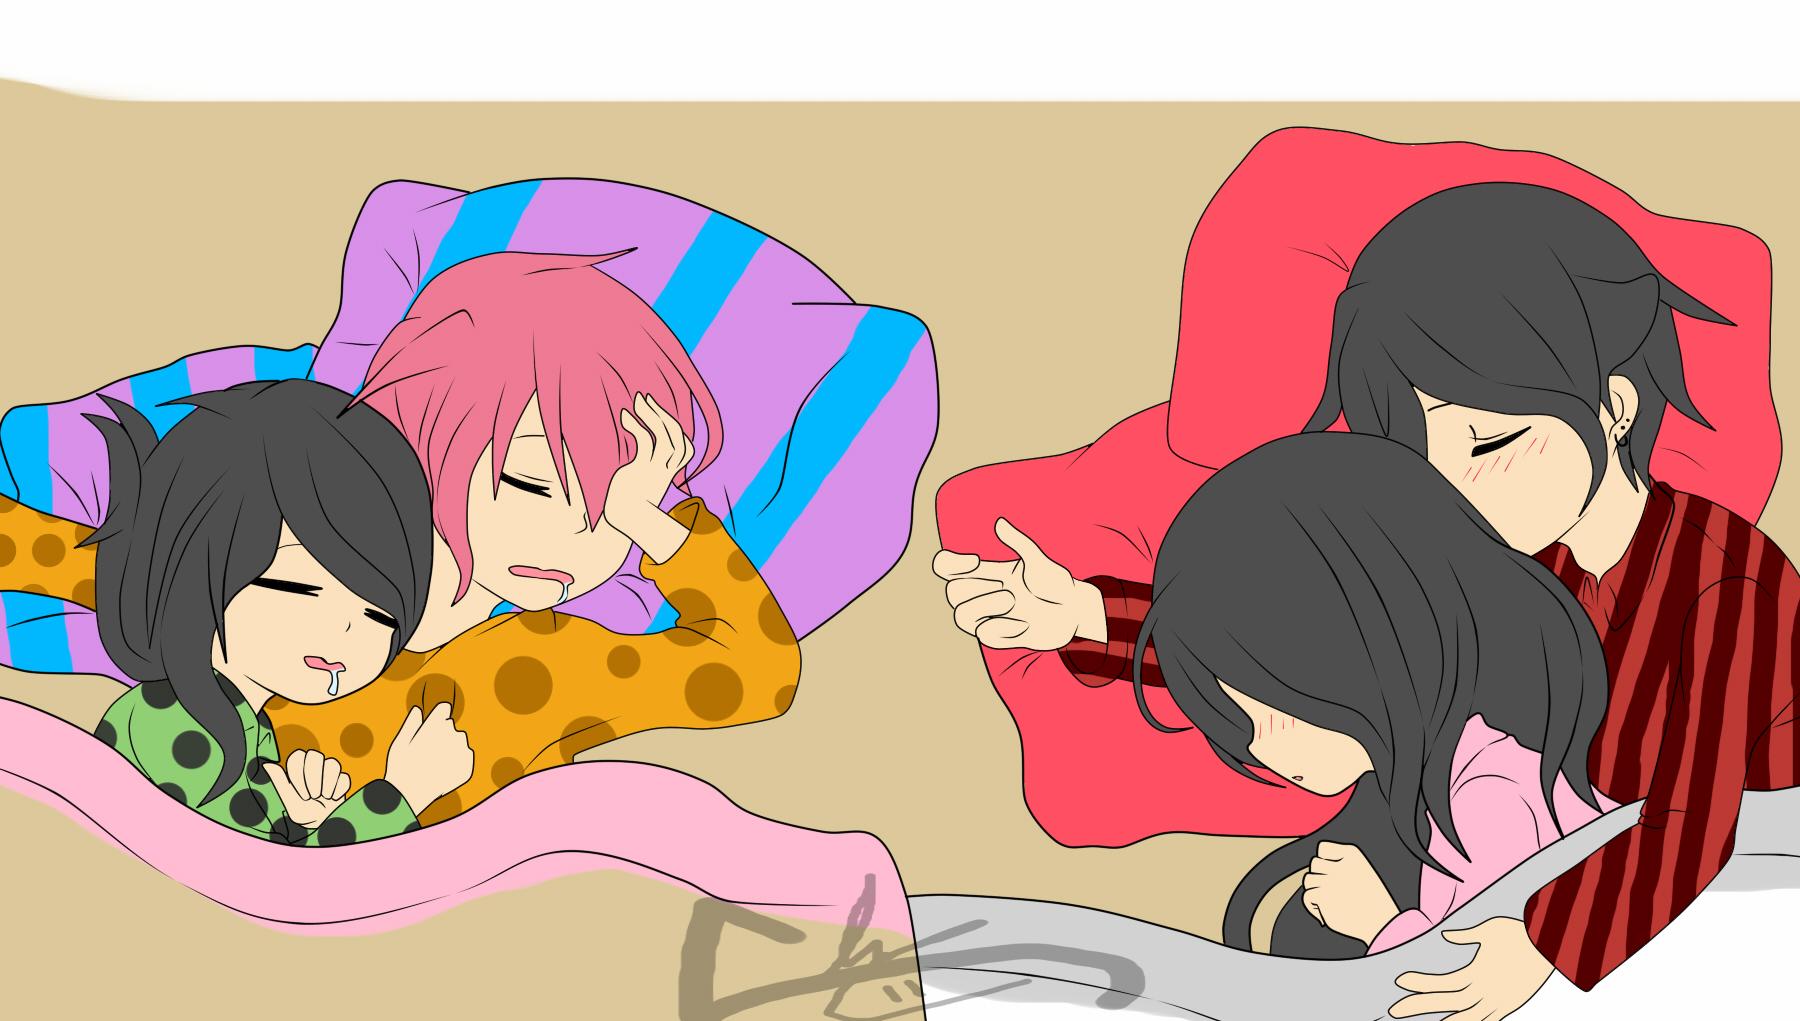 Dormidos by RyuujiKarami